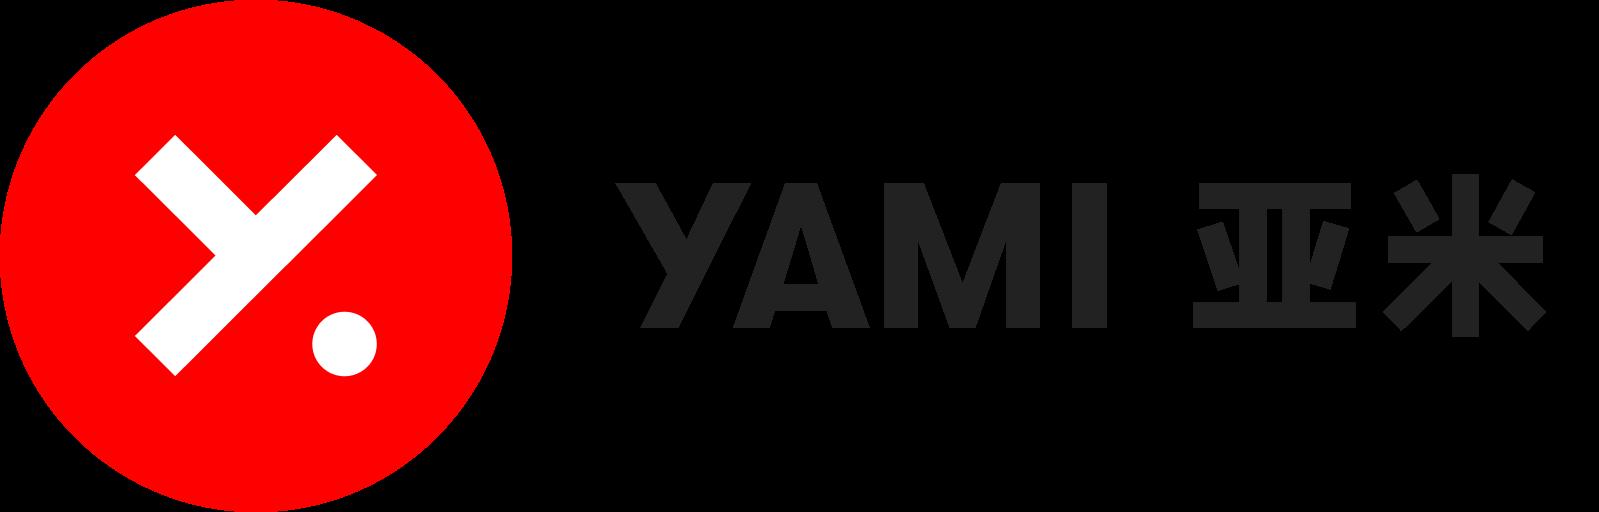 Yamibuy Discount Codes